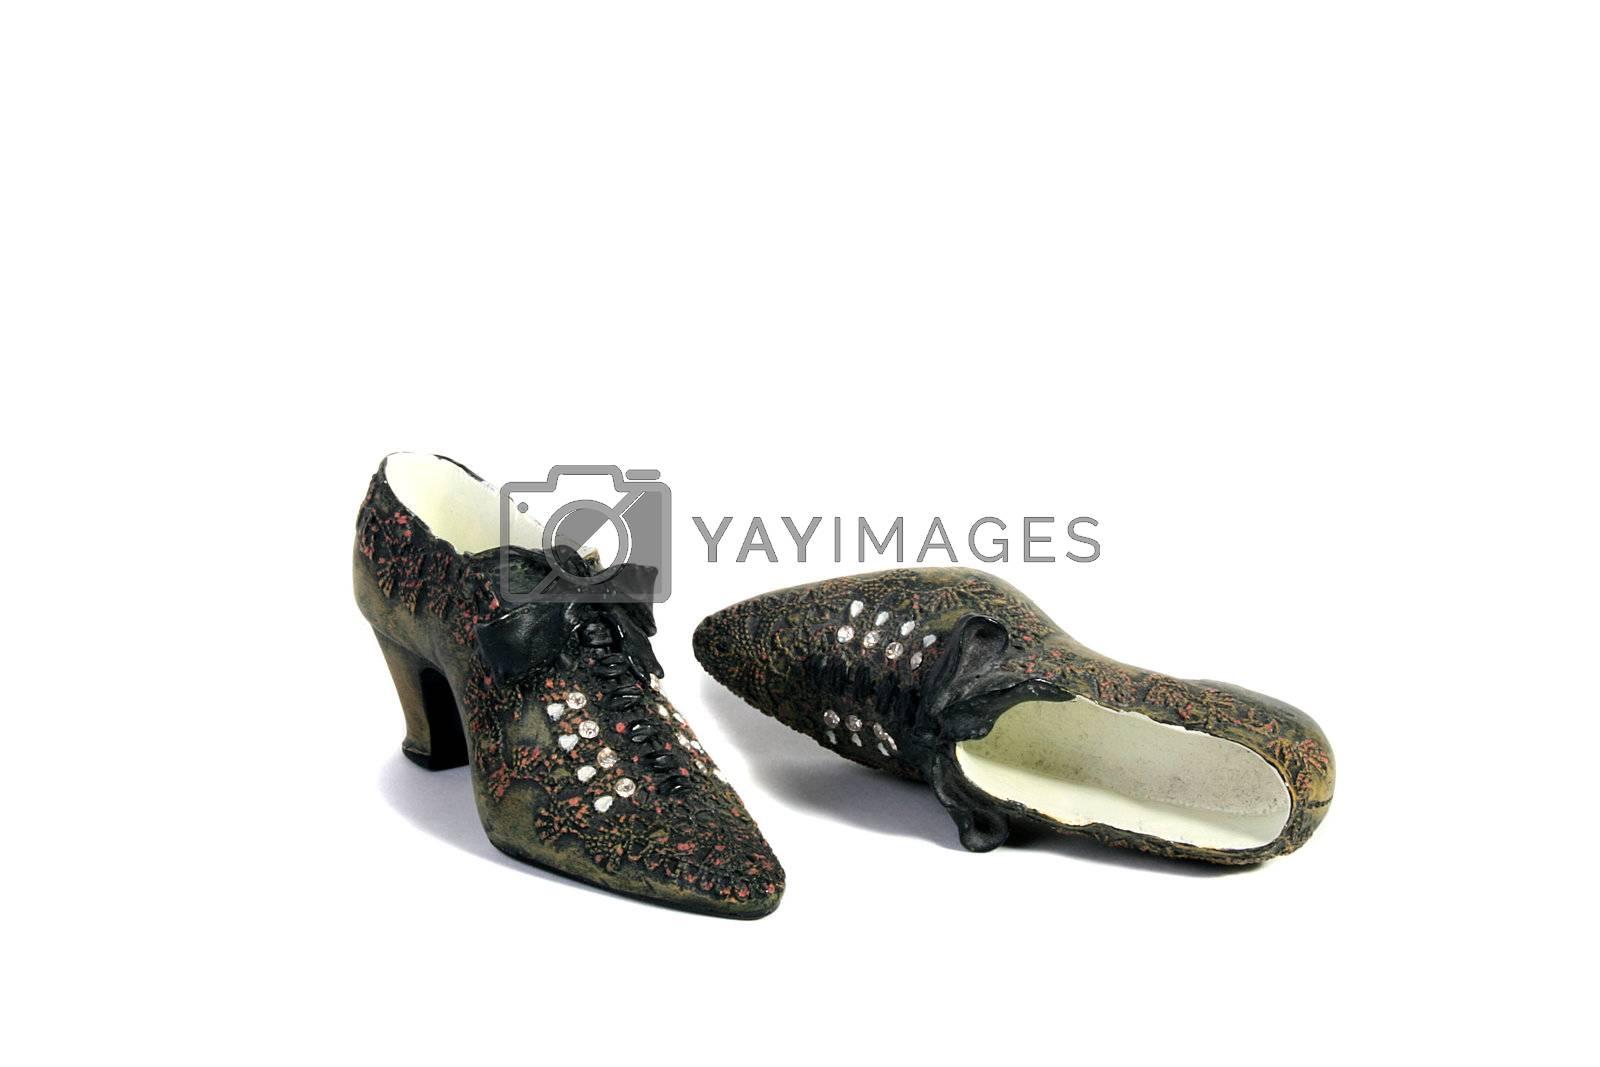 Ceramic decorative shoes for design.